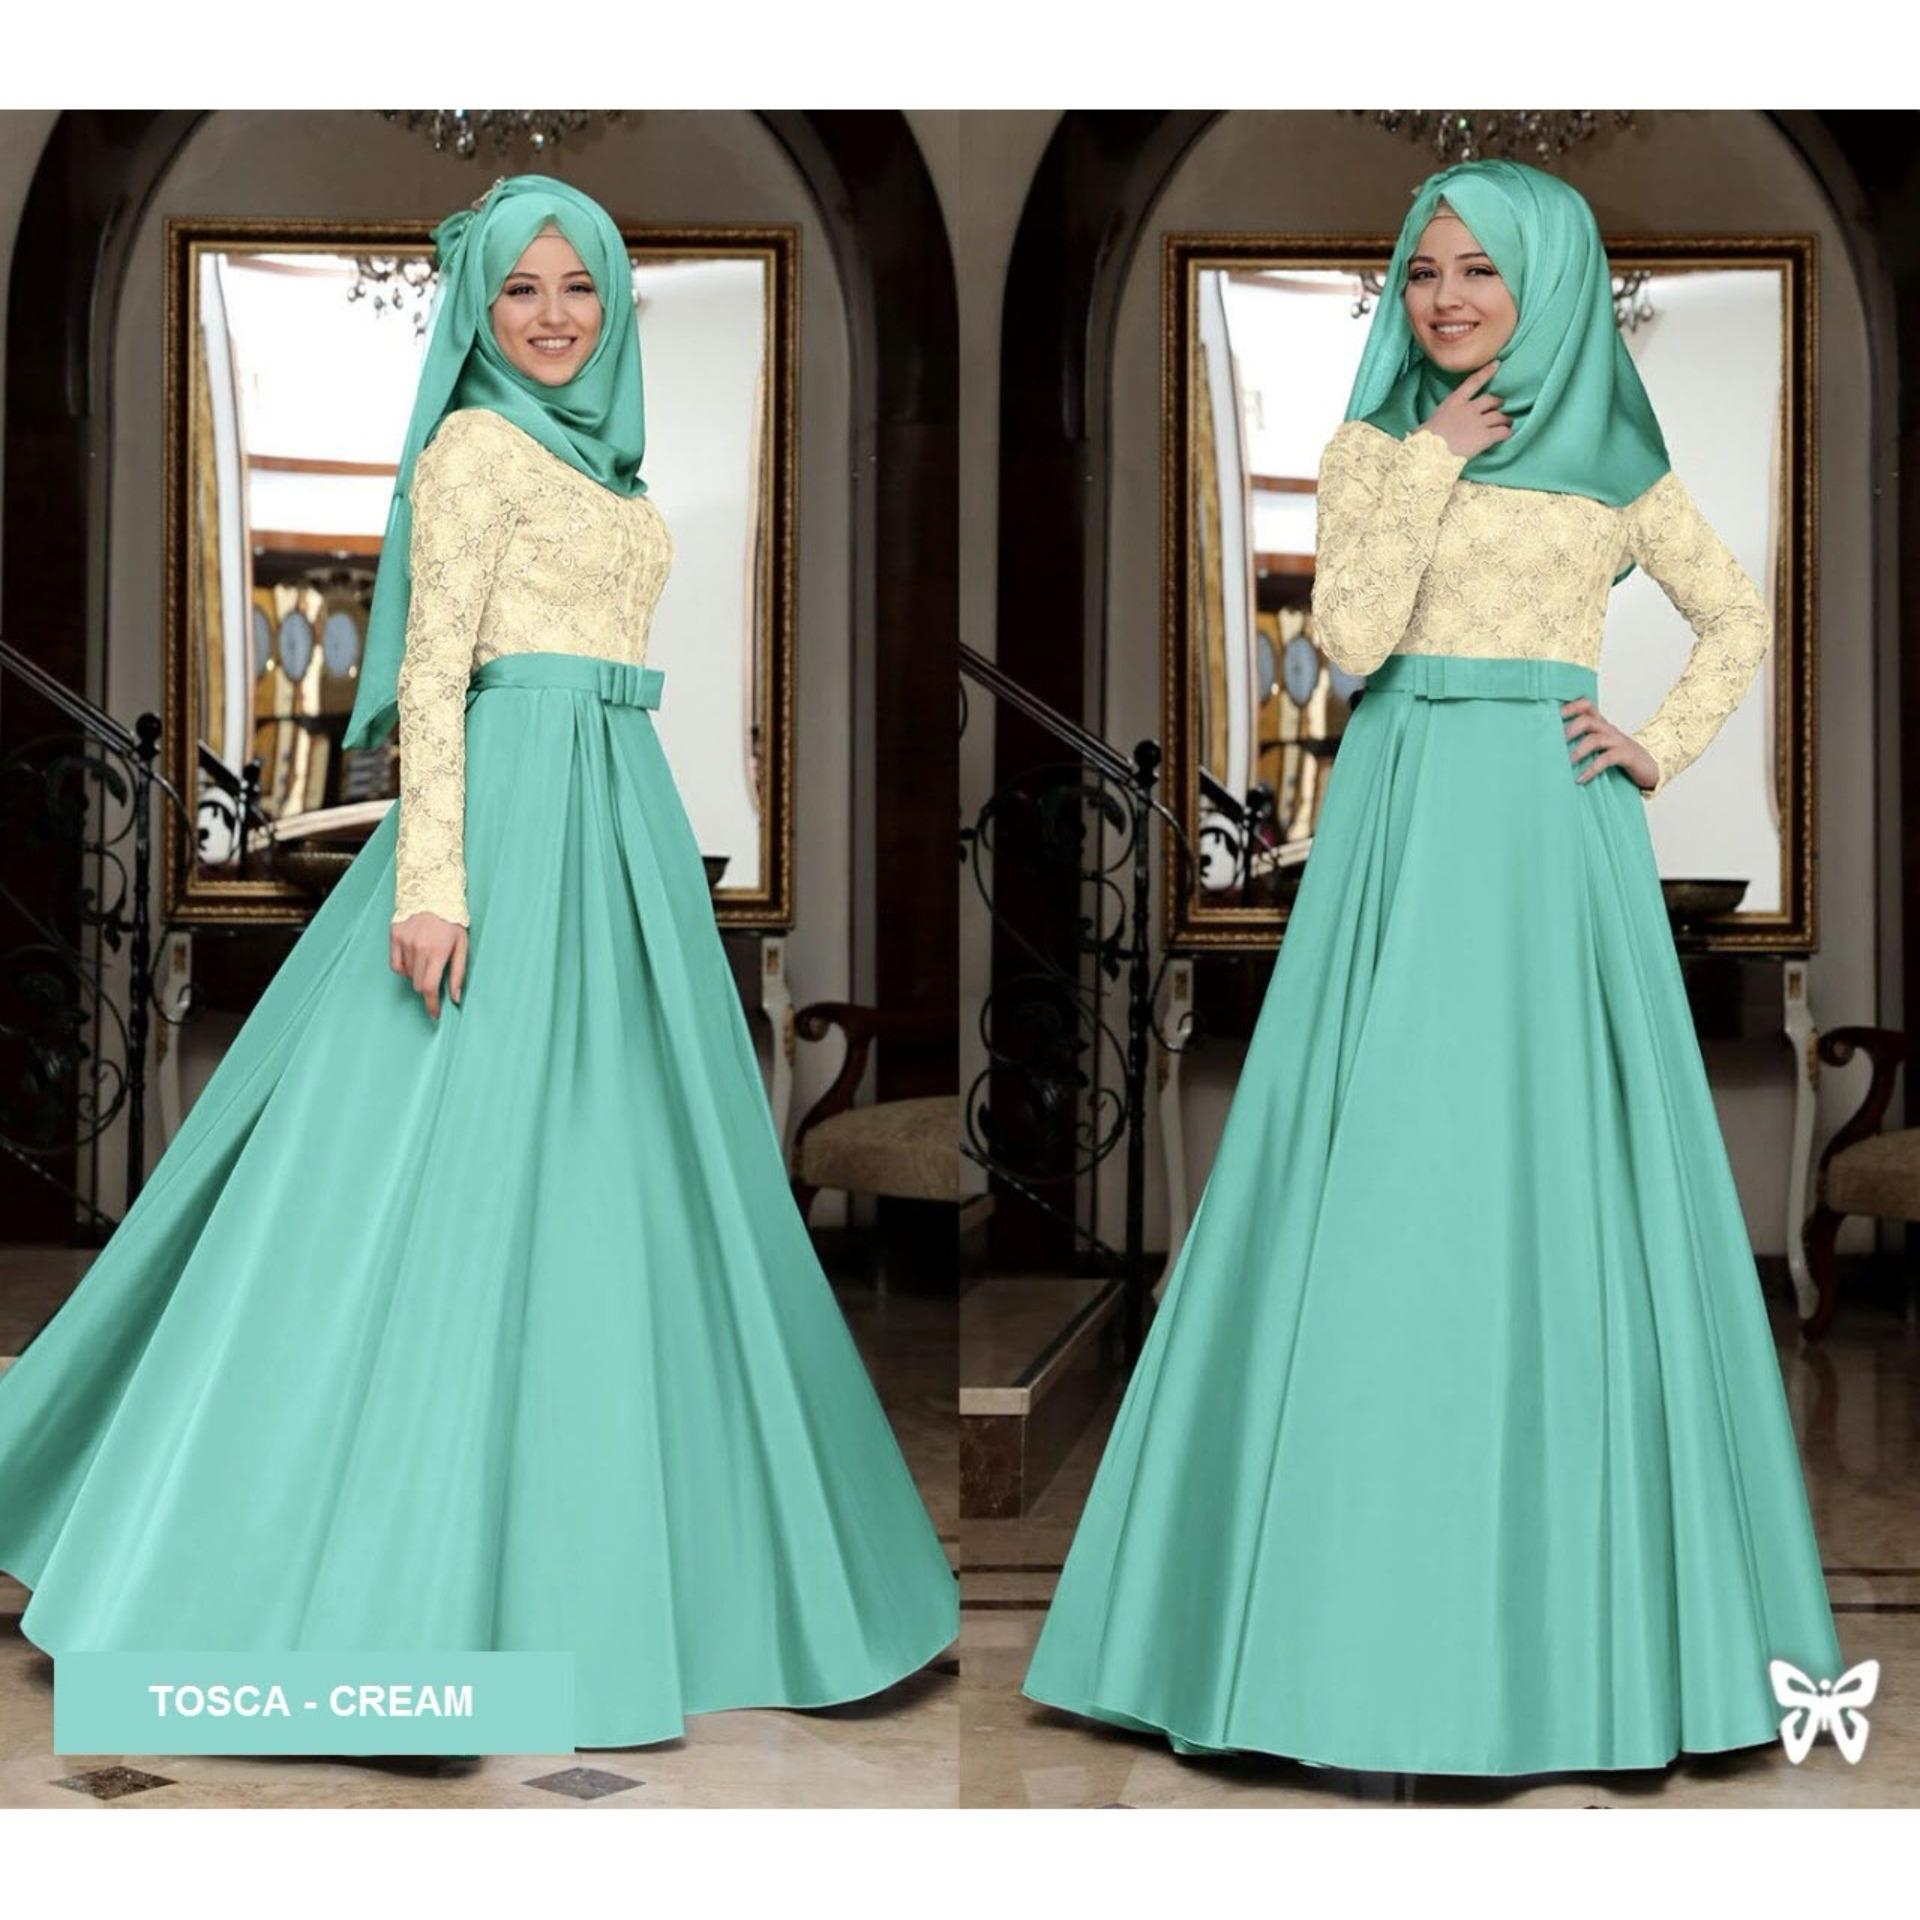 Sera Outfit Maxi Dress Lengan Panjang Set 2 in 1 MSR020 / Gamis Syari / Gaun Pesta Muslimah / Baju Muslim Wanita Syar'i / Hijab / Srmahira